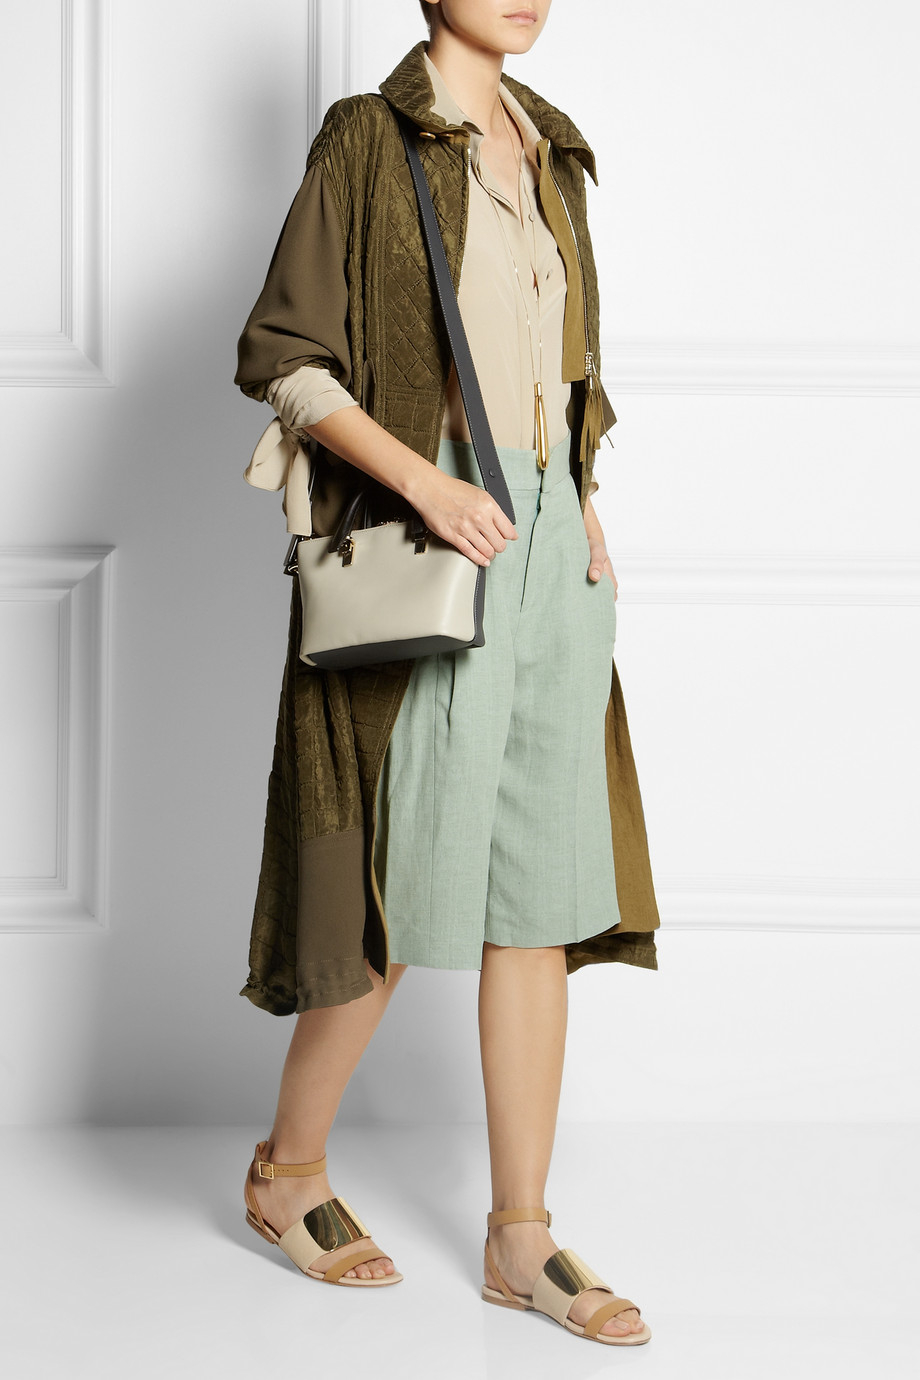 chloe white leather handbag